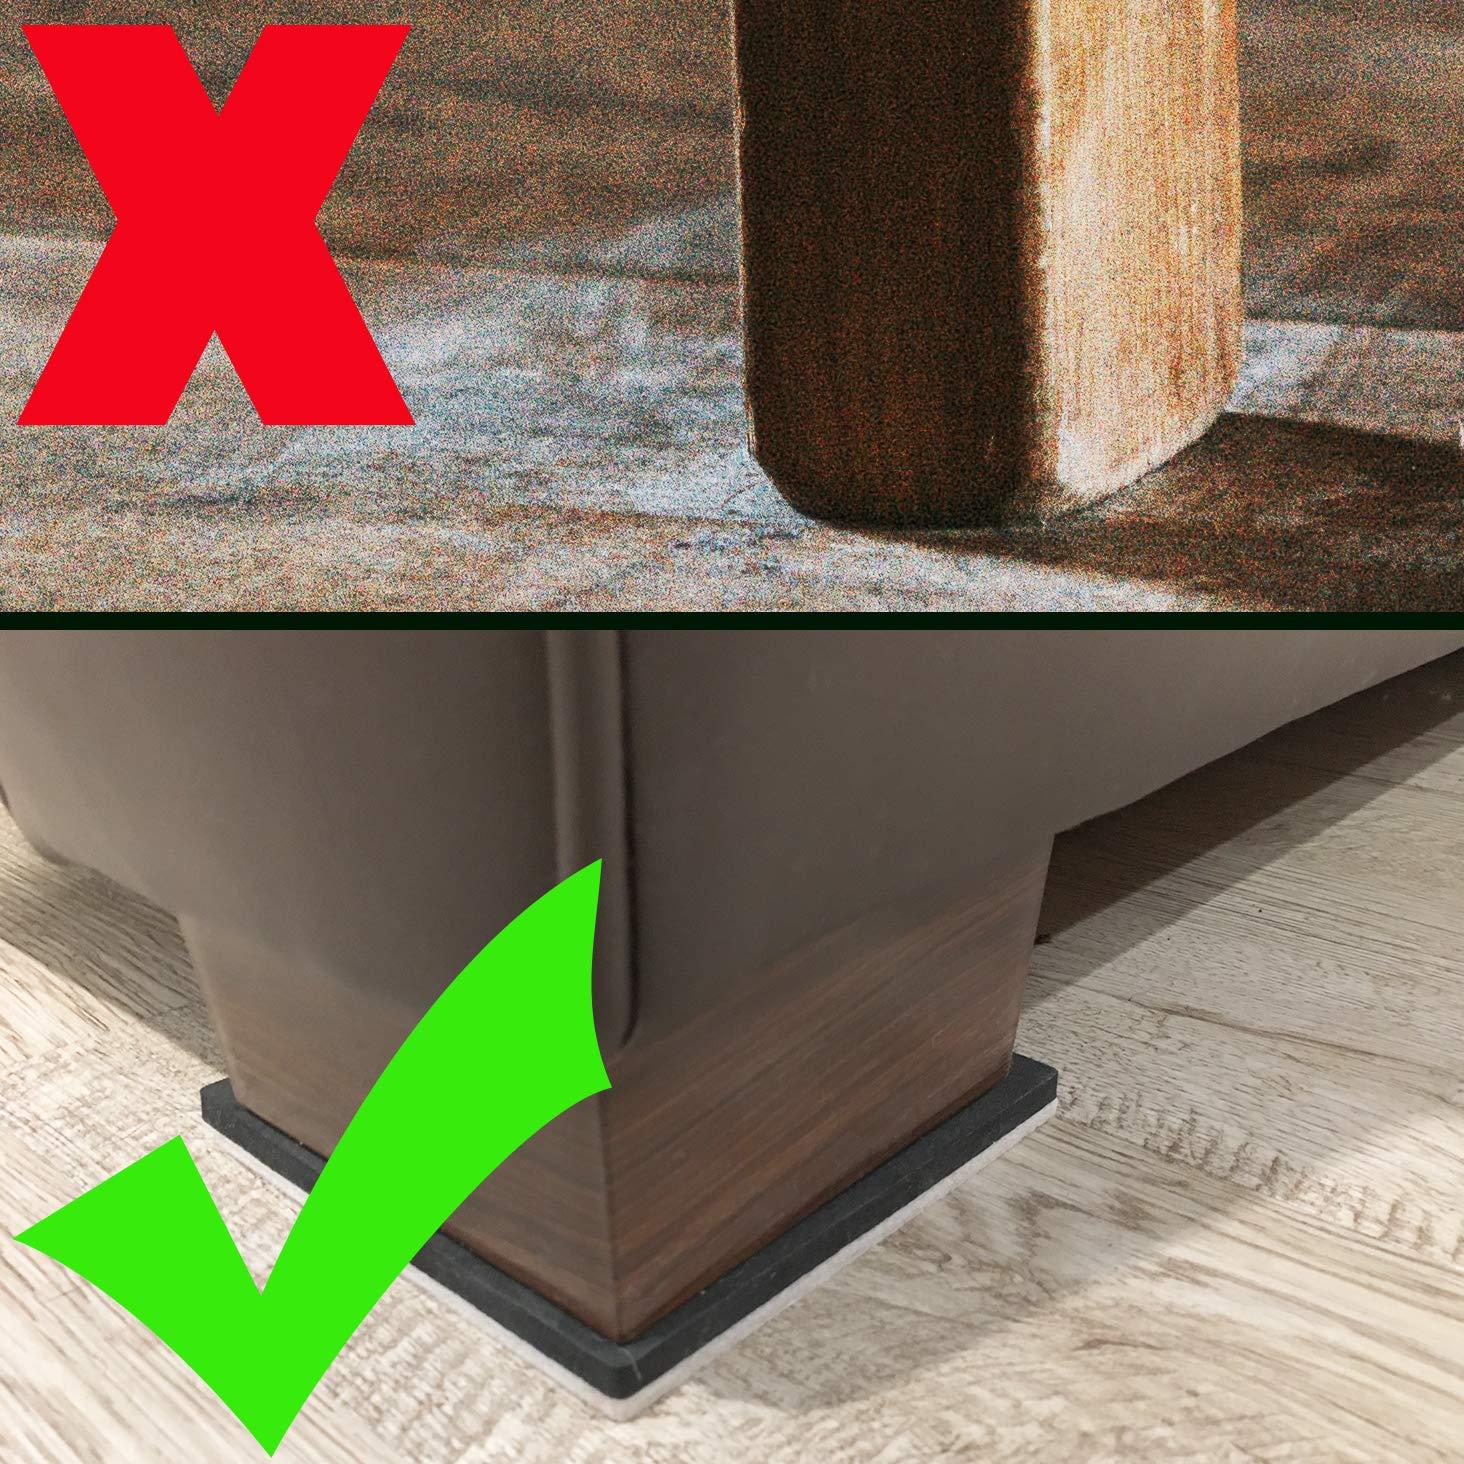 Liyic 4in.Square 16 Pack Felt Sliders for Hard Surfaces-Felt Furniture Sliders - Heavy Duty Sliders - Reusable Hardwood Floor Sliders -Furniture Moving Sliders-Sofa Sliders Gliders Glides Movers by Liyic (Image #5)